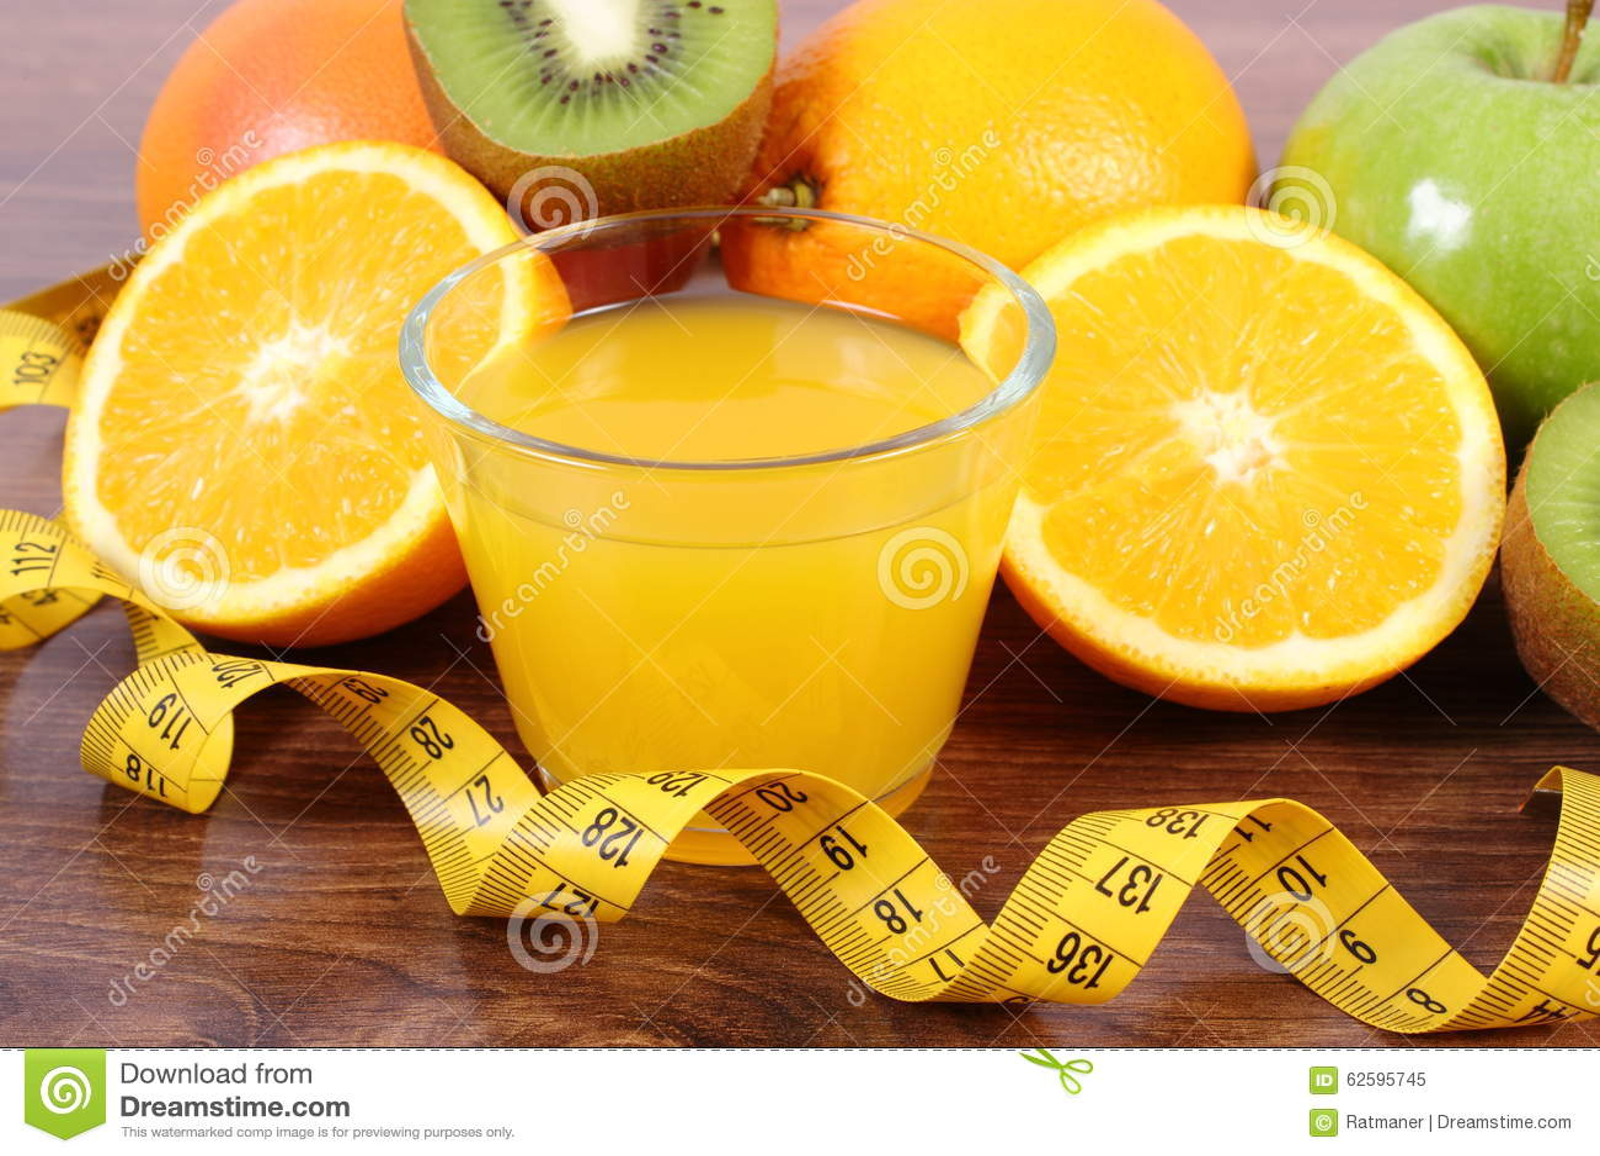 how healthy is kiwi fruit is fresh fruit juice healthy